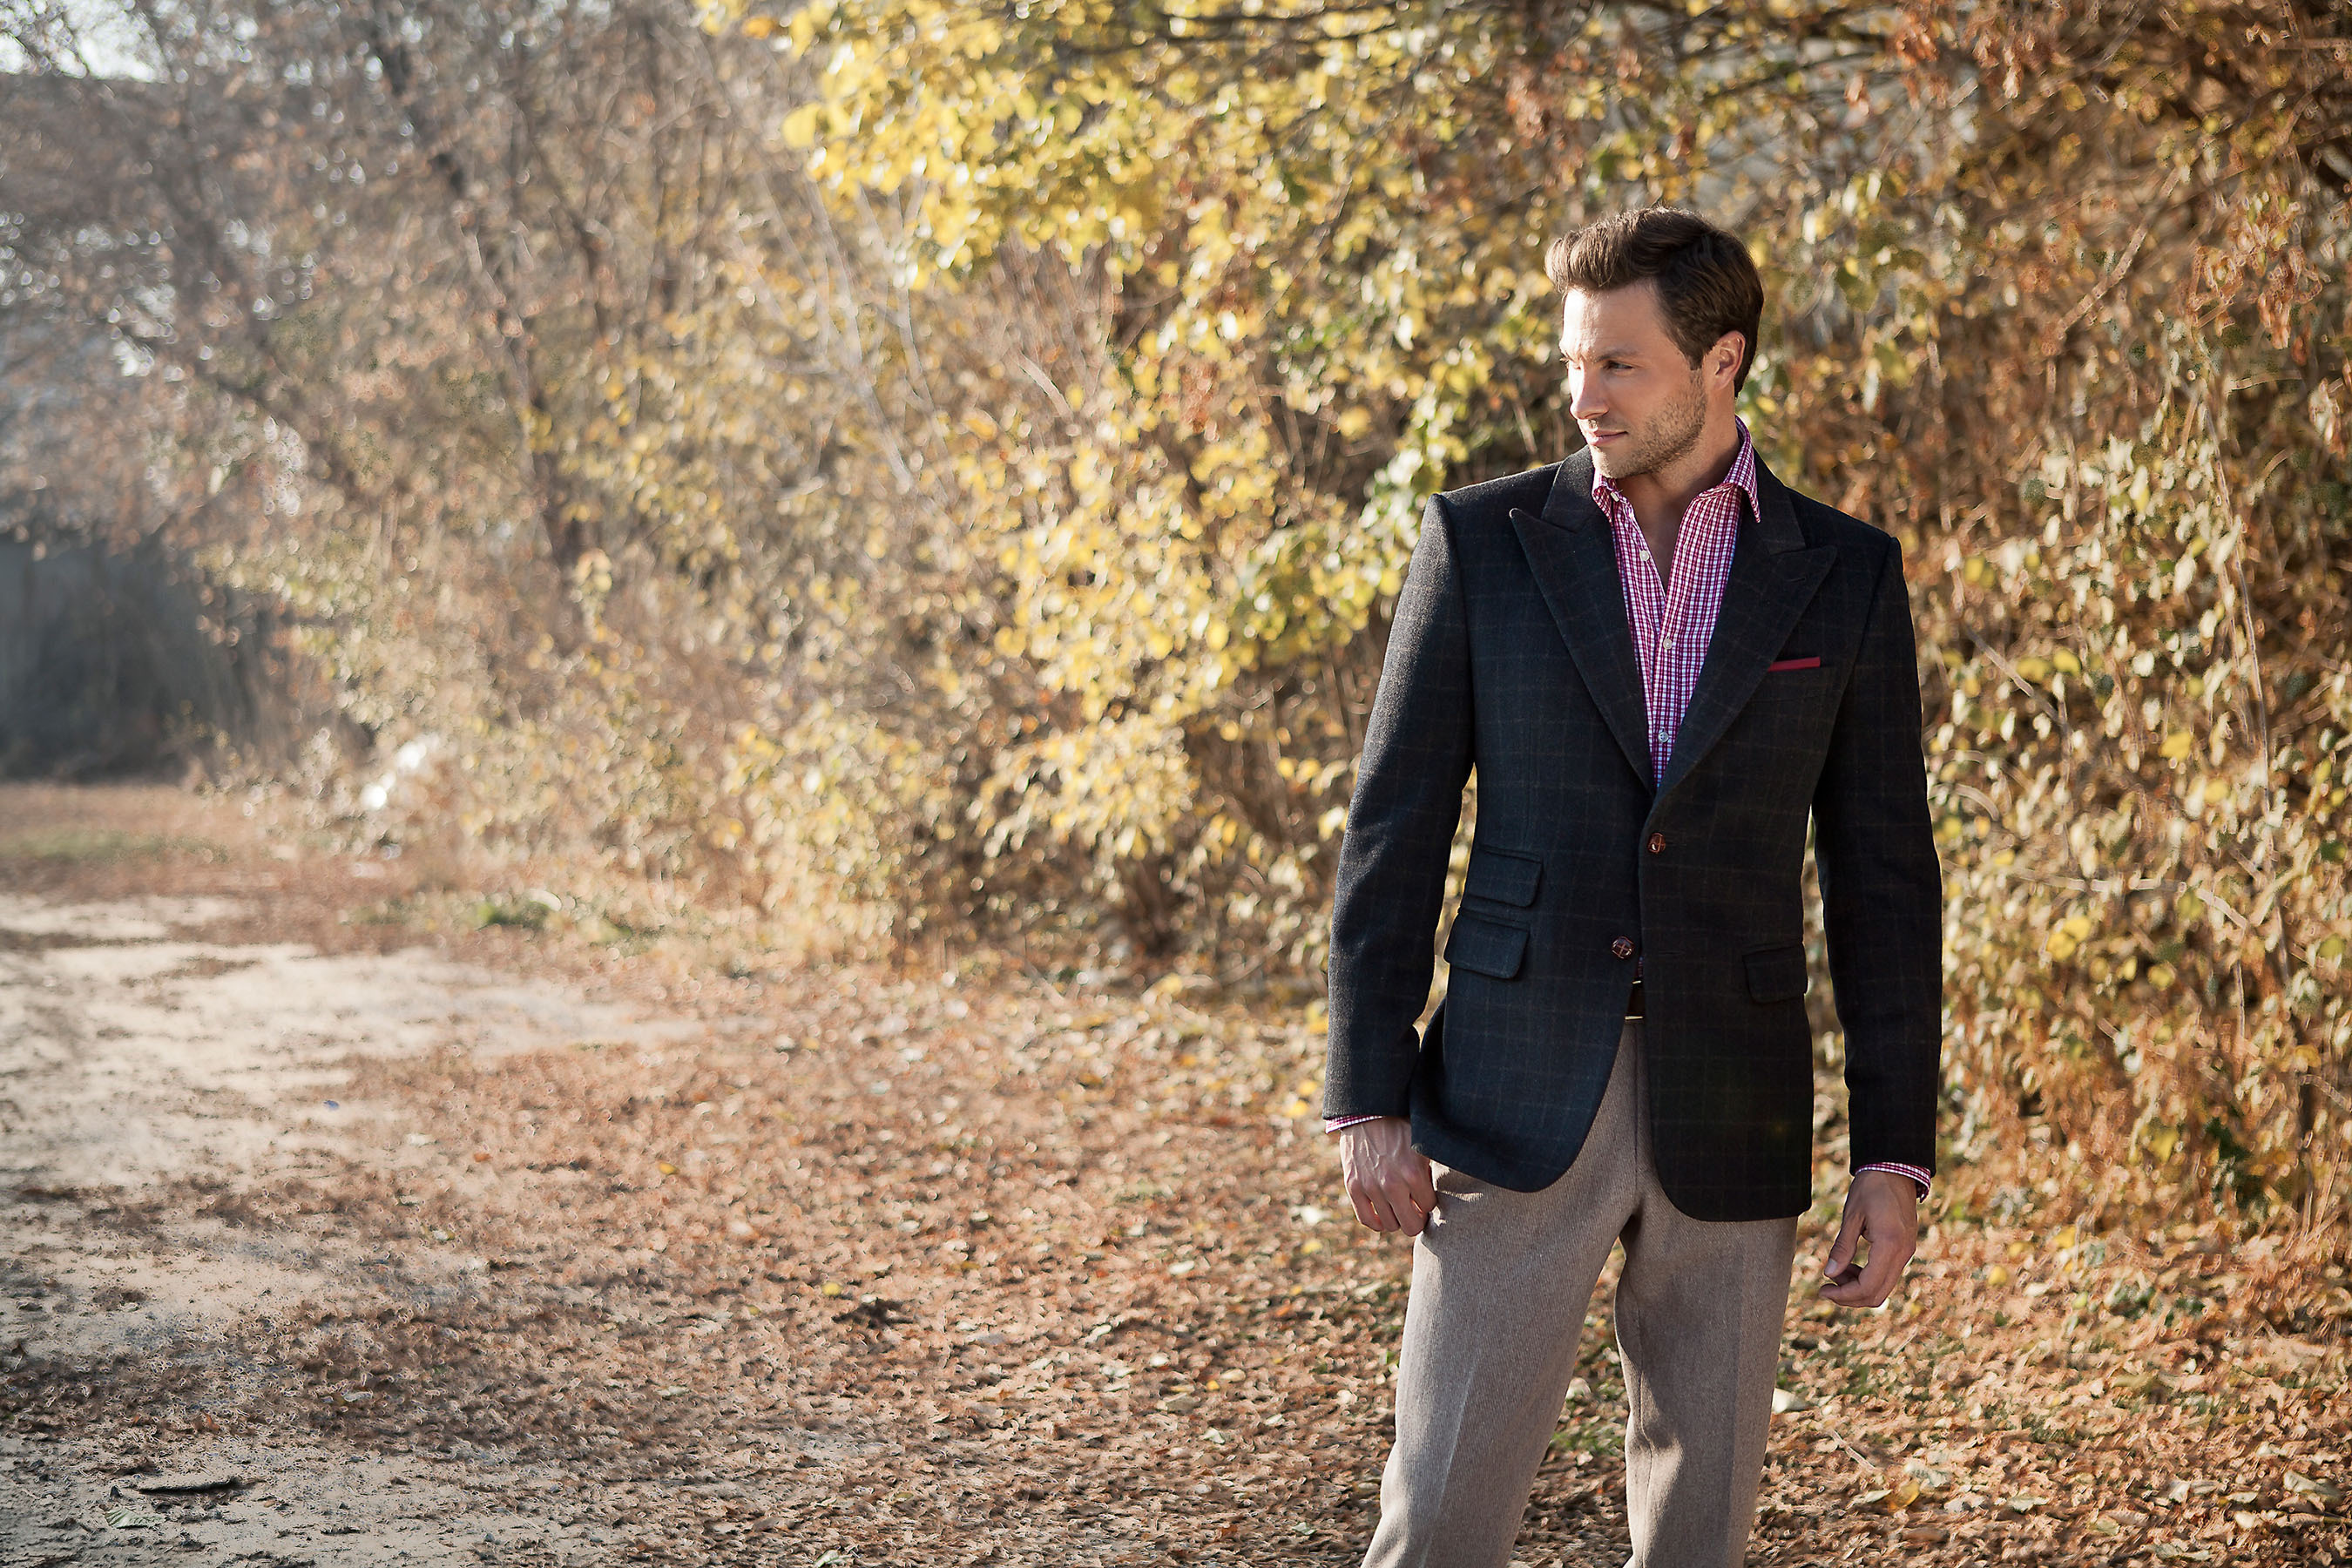 The Birmingham Winter Blazer with Ash Brown Wool Pants (c)Suitly Apparel Inc.  (PRNewsFoto/Suitly.com)